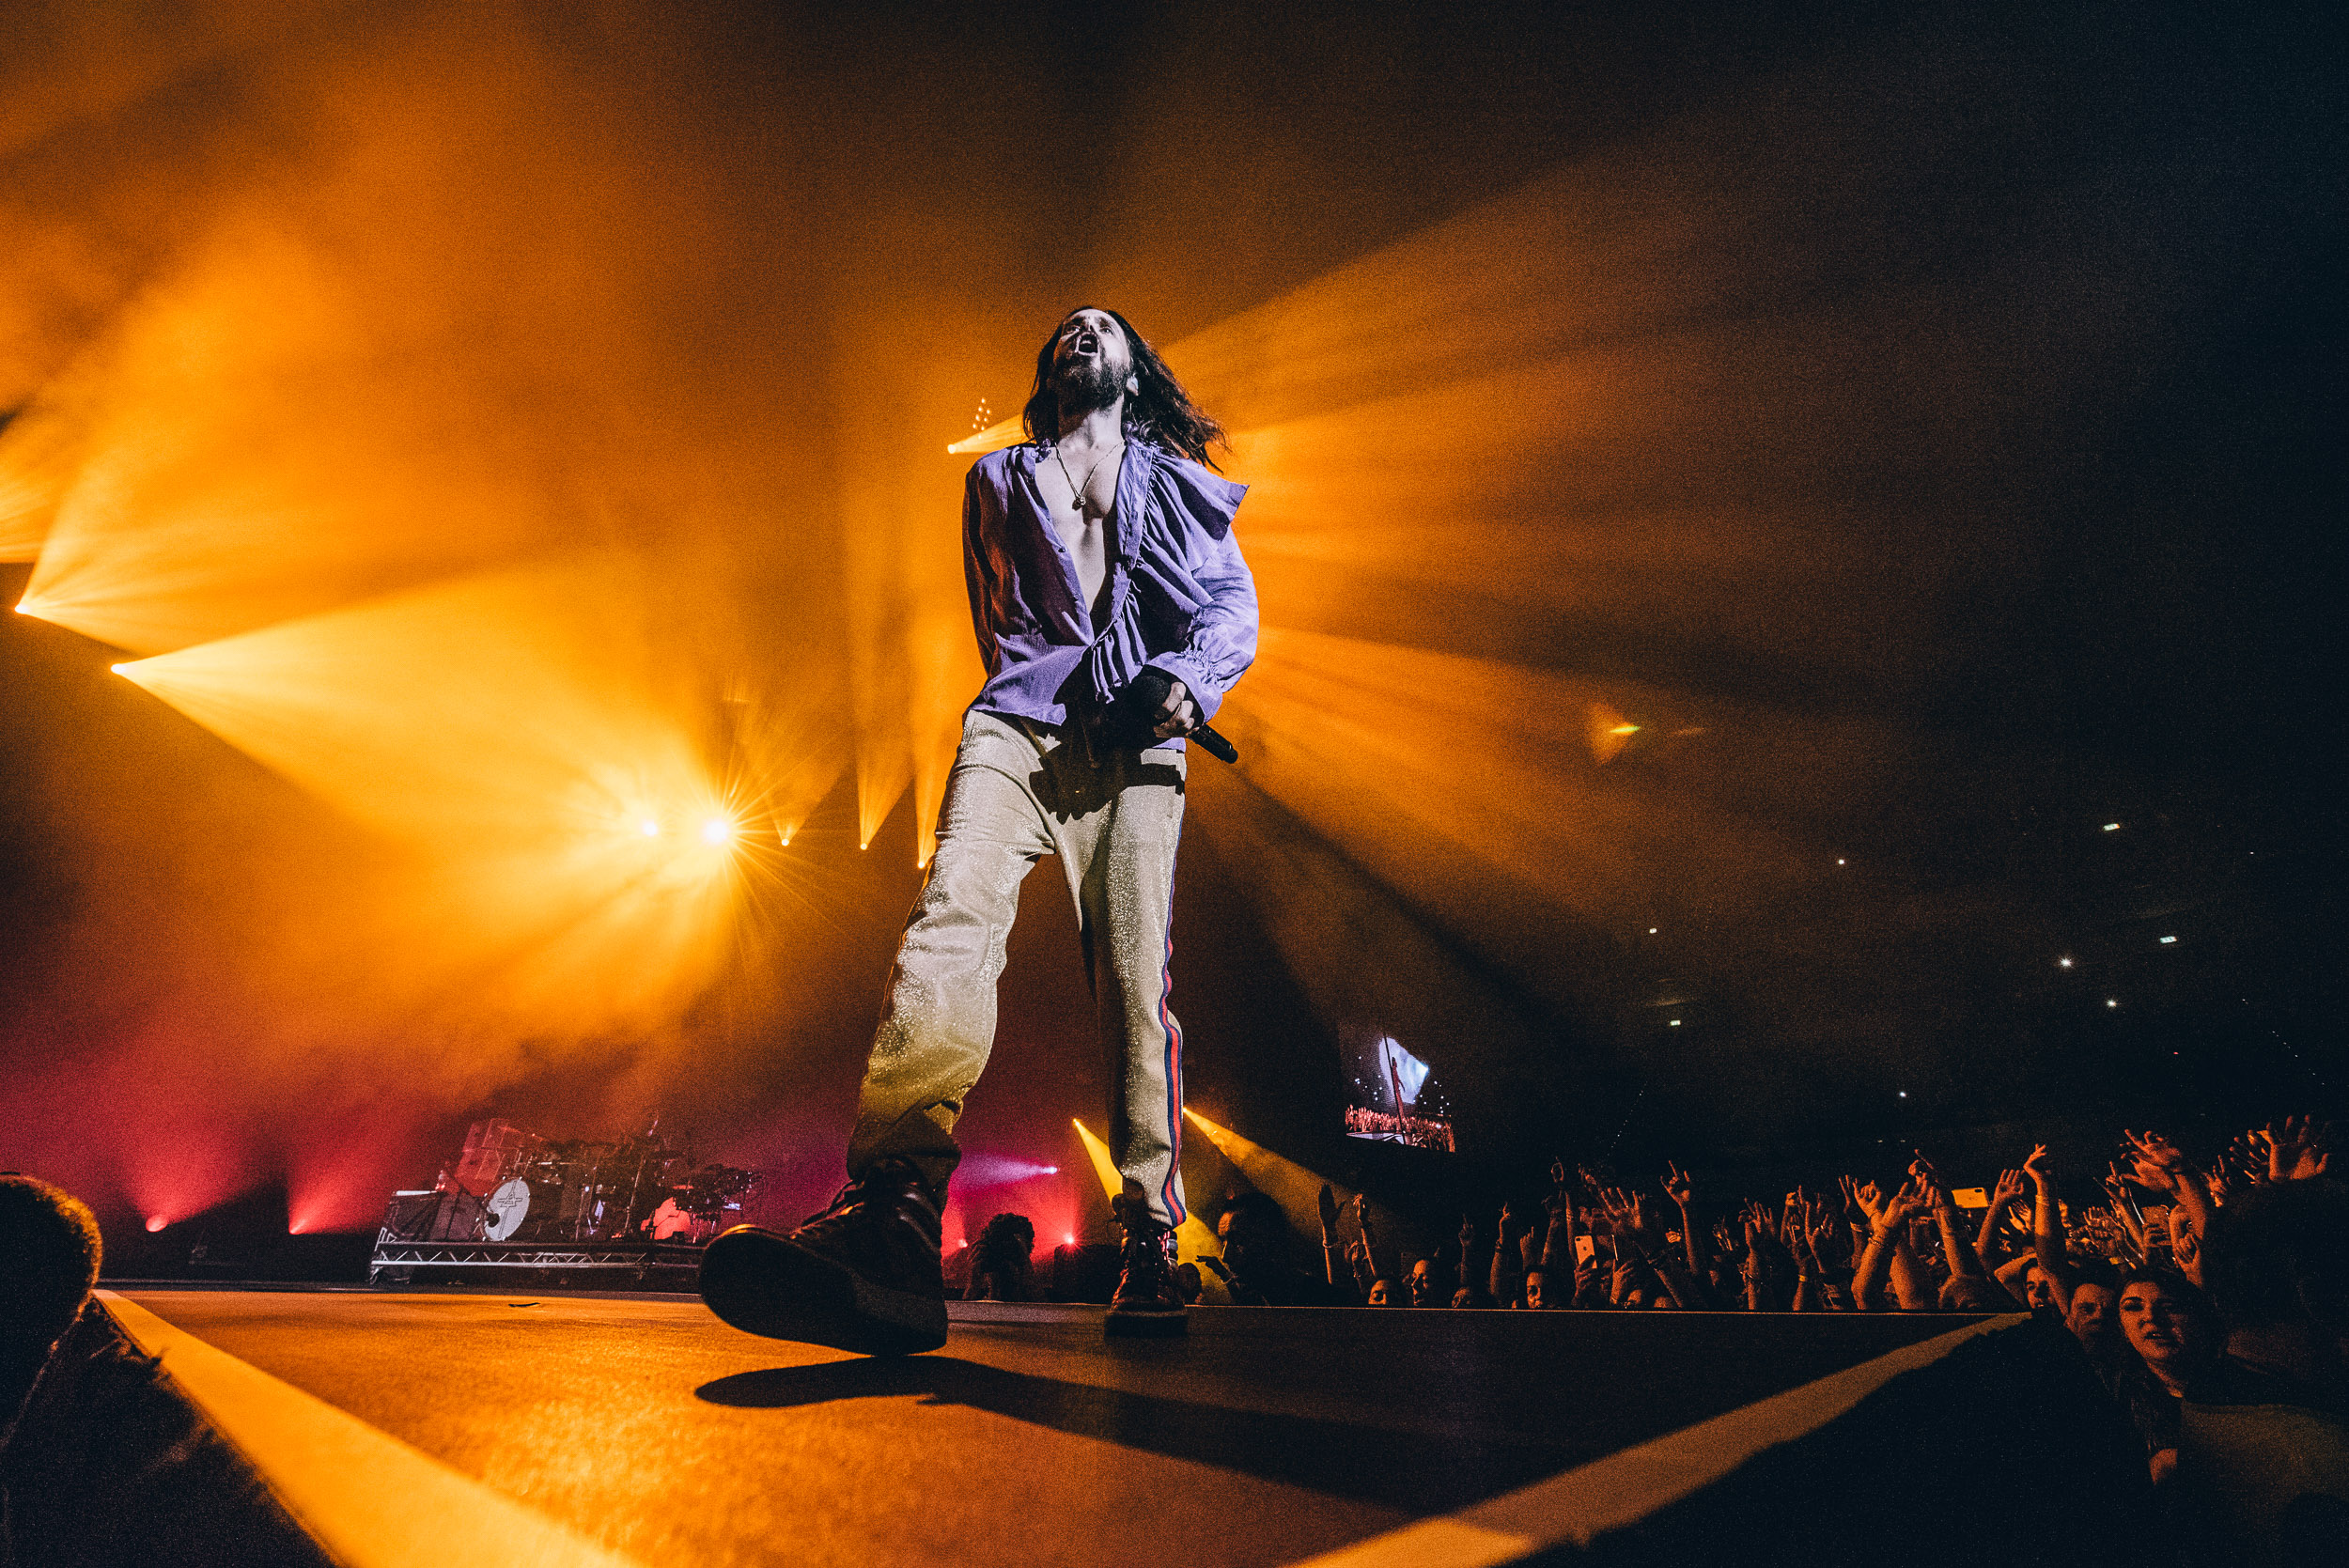 30 Seconds to Mars Altice Arena 20180912-1173.jpg